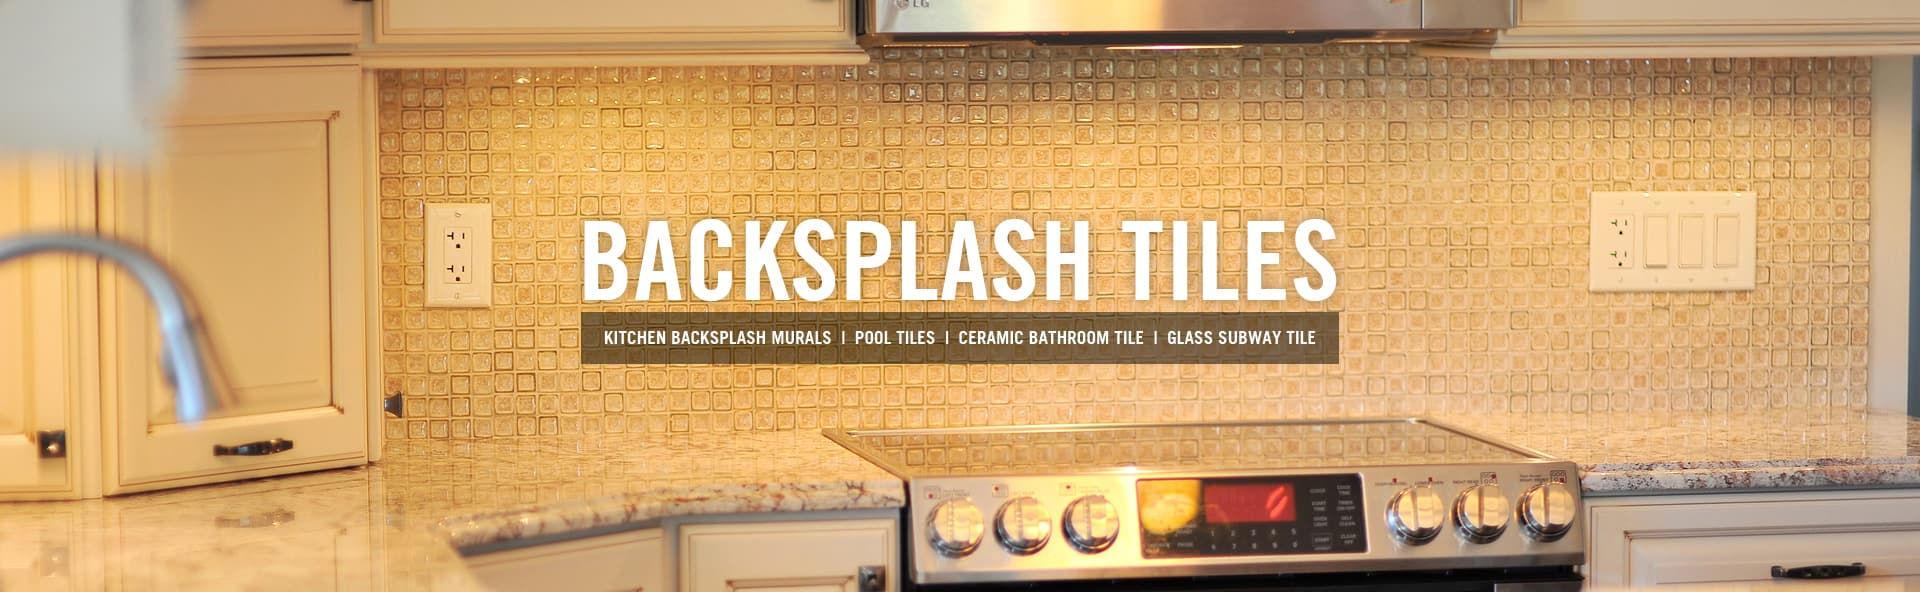 Kitchen Backsplash  Tiles | Glass Mosaic Tile | subway glass backsplashes